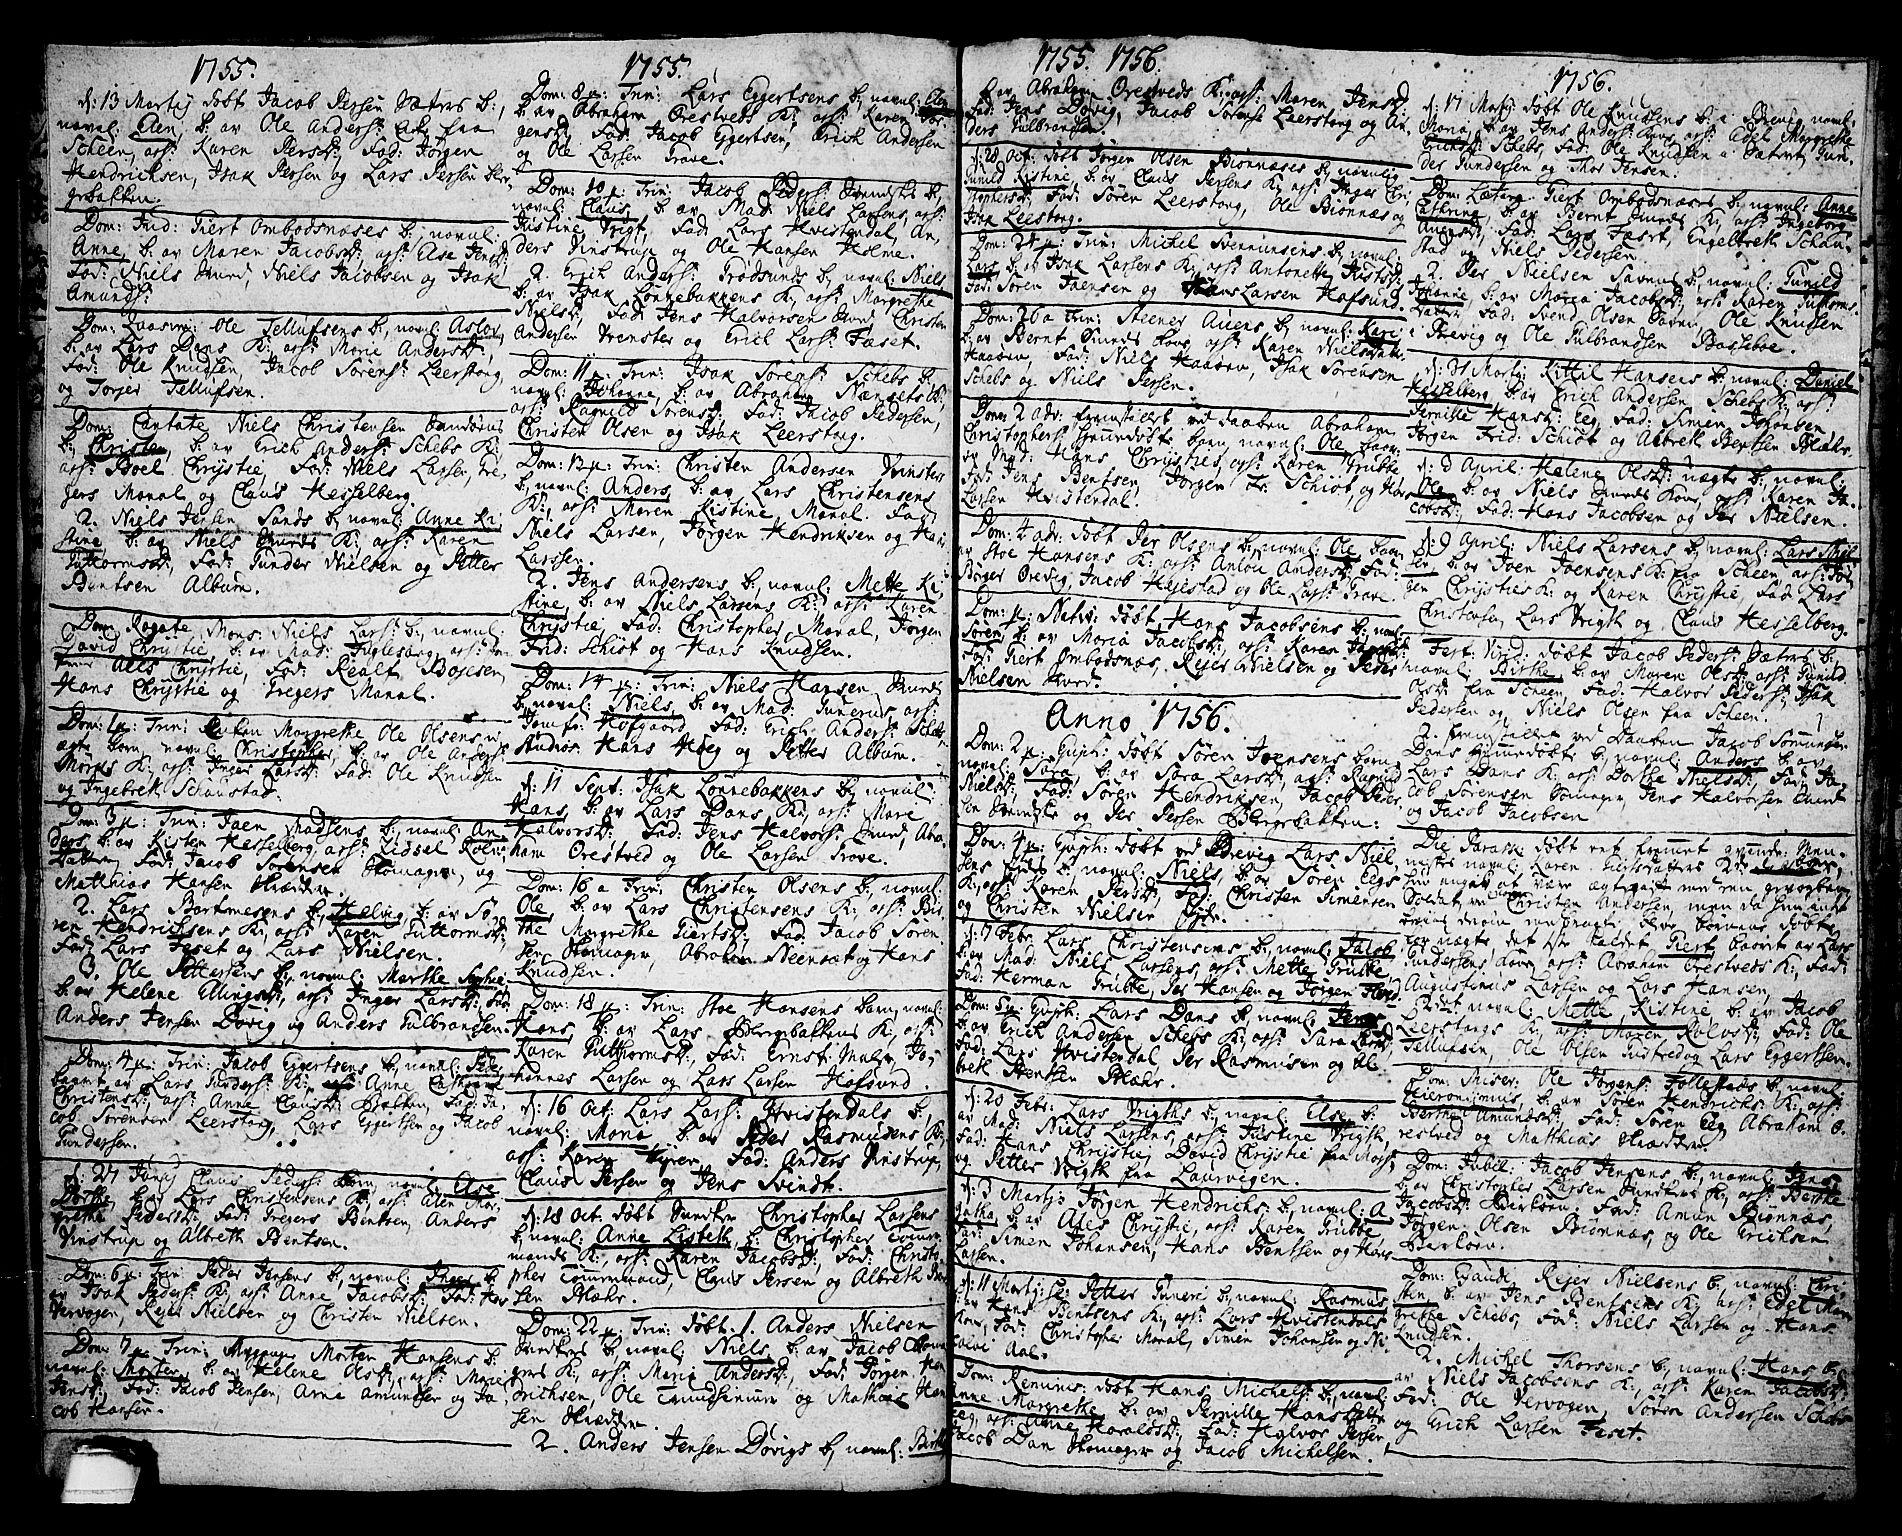 SAKO, Brevik kirkebøker, F/Fa/L0002: Ministerialbok nr. 2, 1720-1764, s. 35d